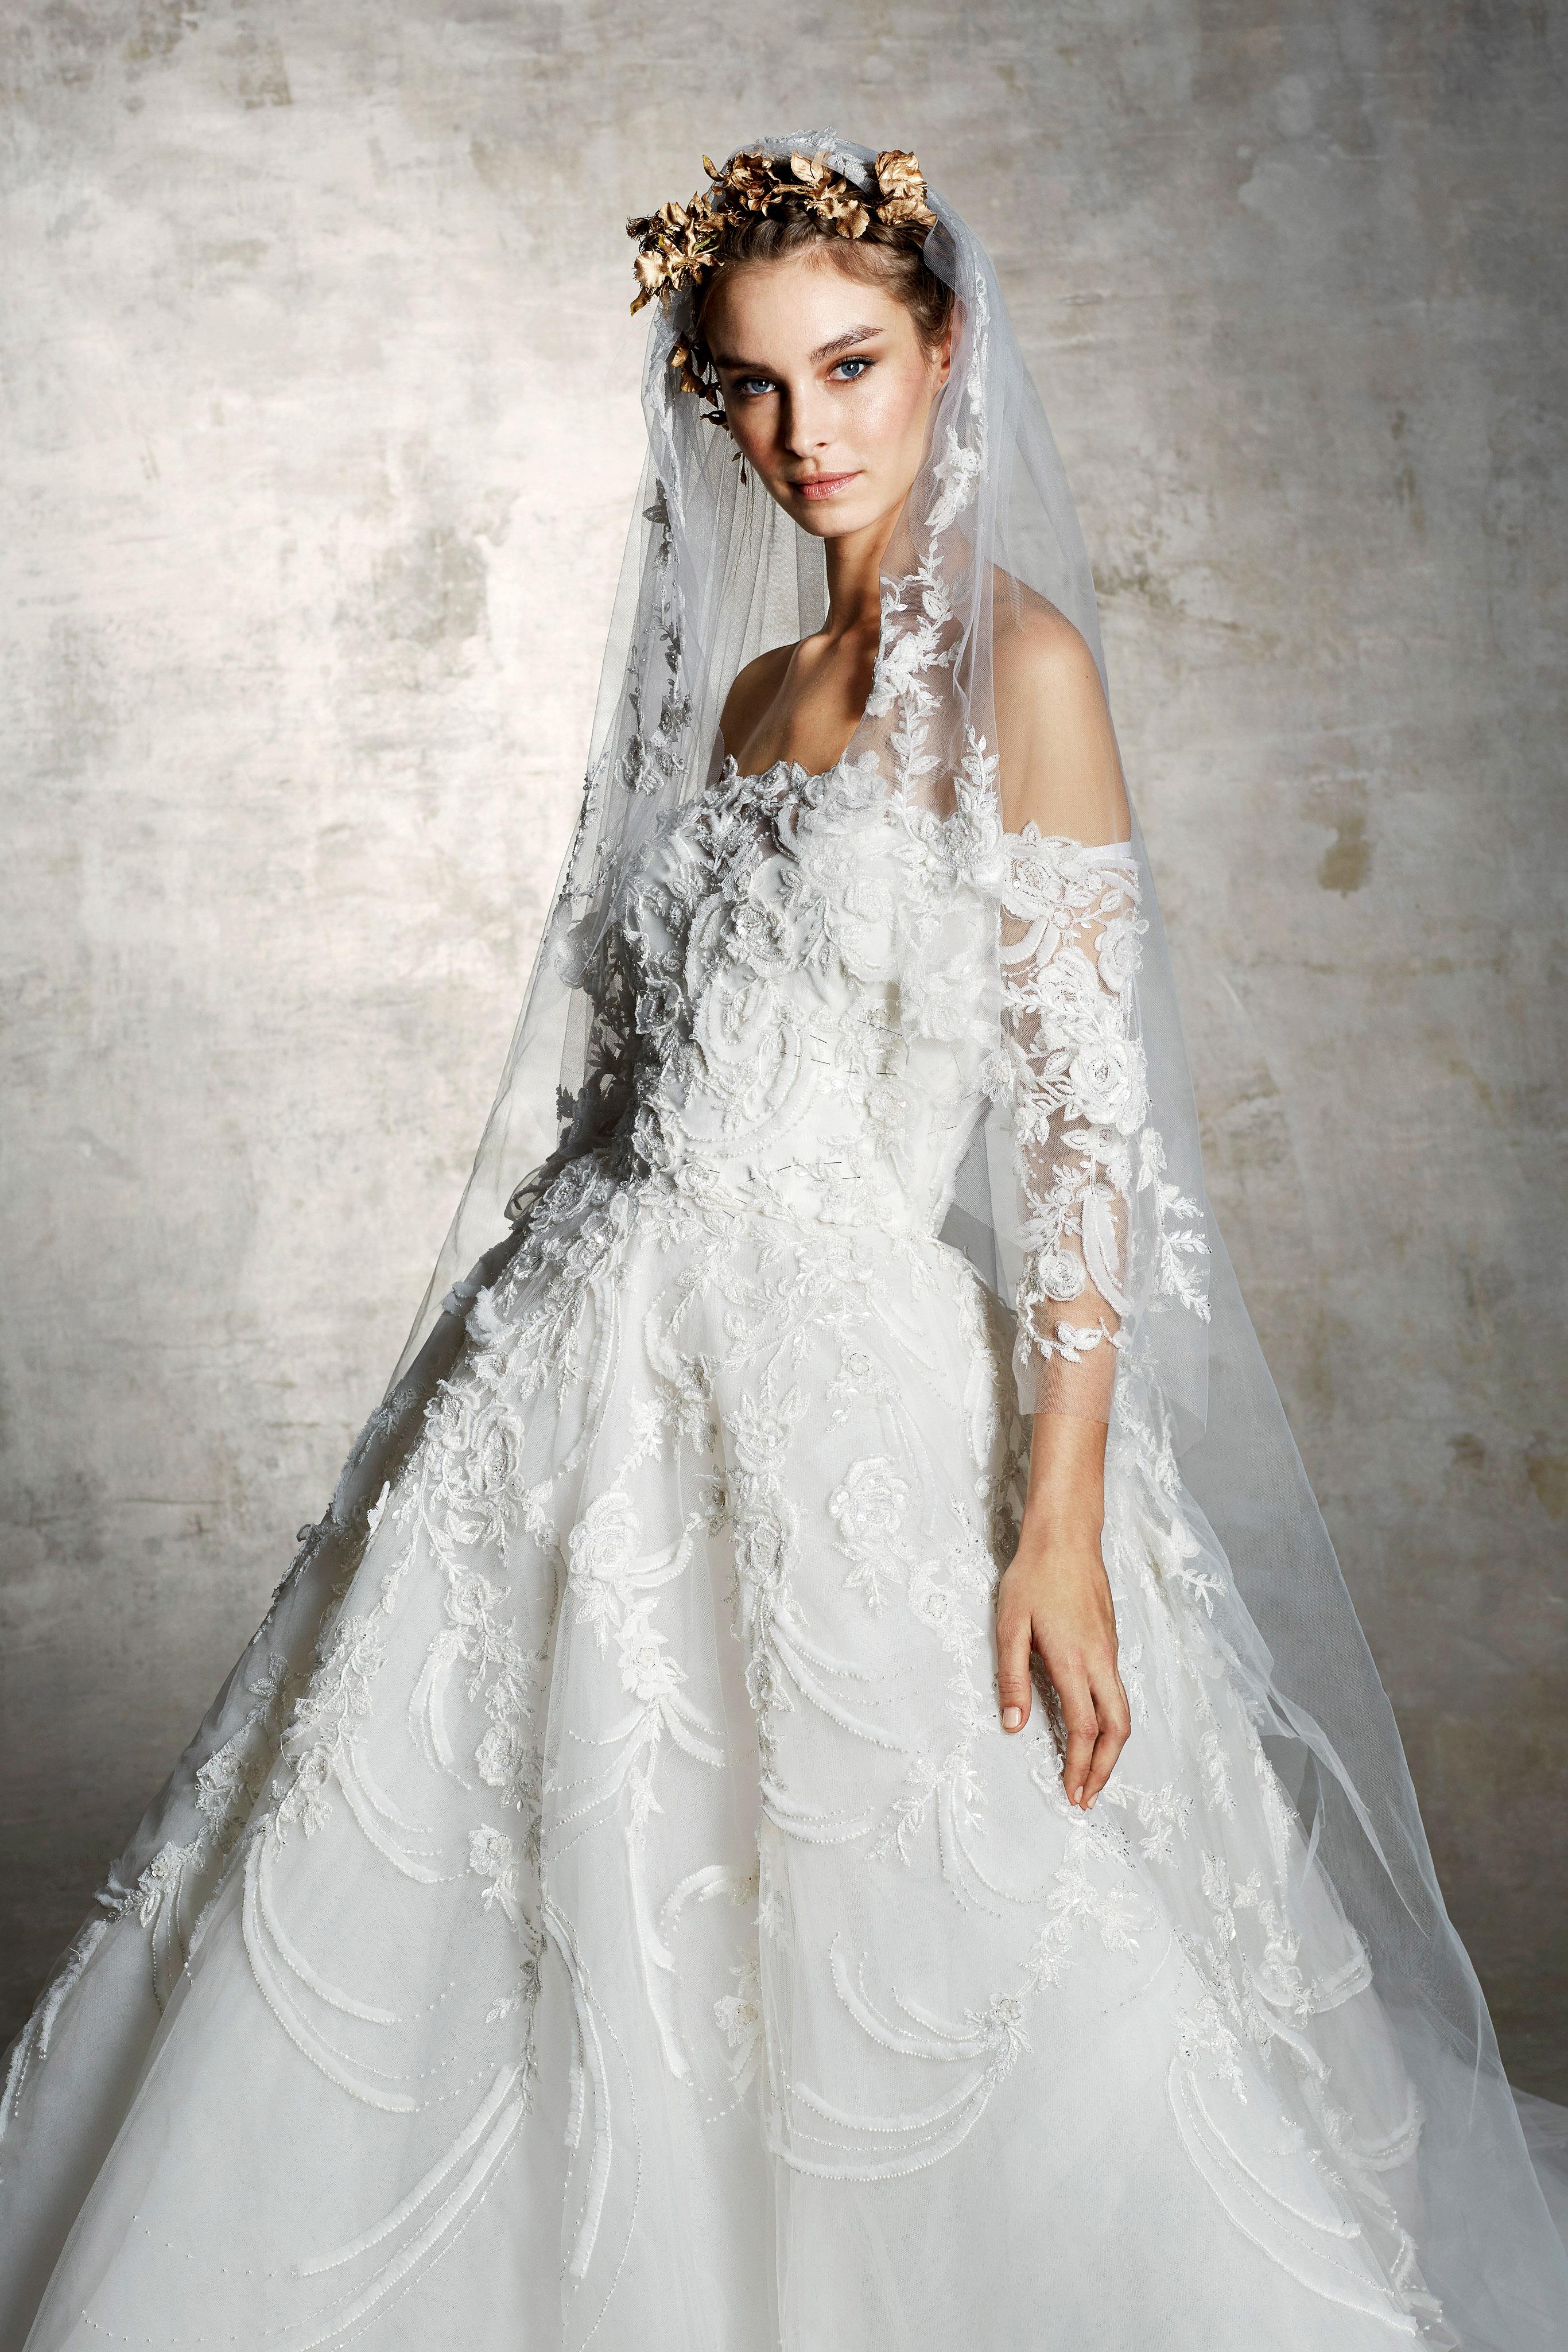 marchesa bridal wedding dress off the shoulder a-line floral embroidery veil